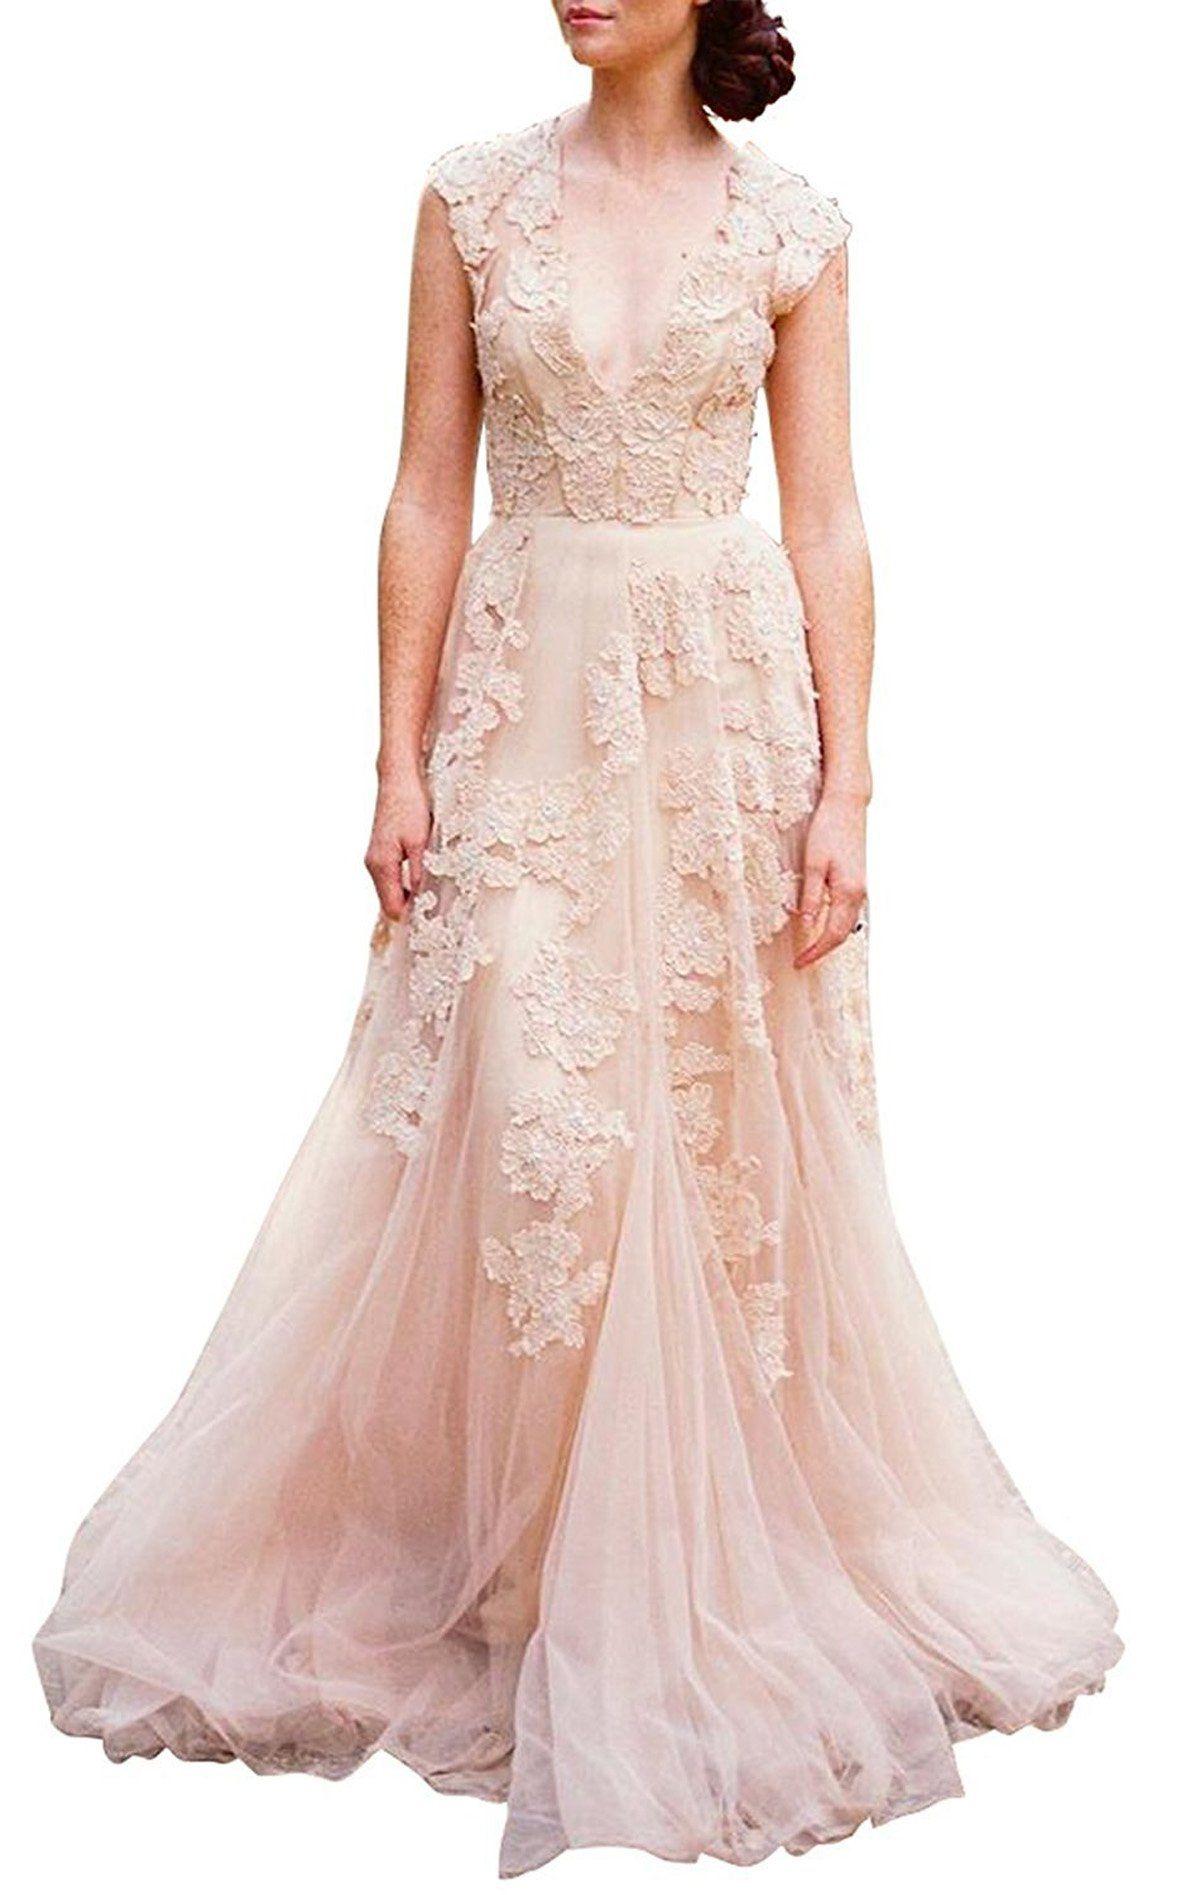 Weddinglee bridal gowns wedding dress orange pink wedding dress plus